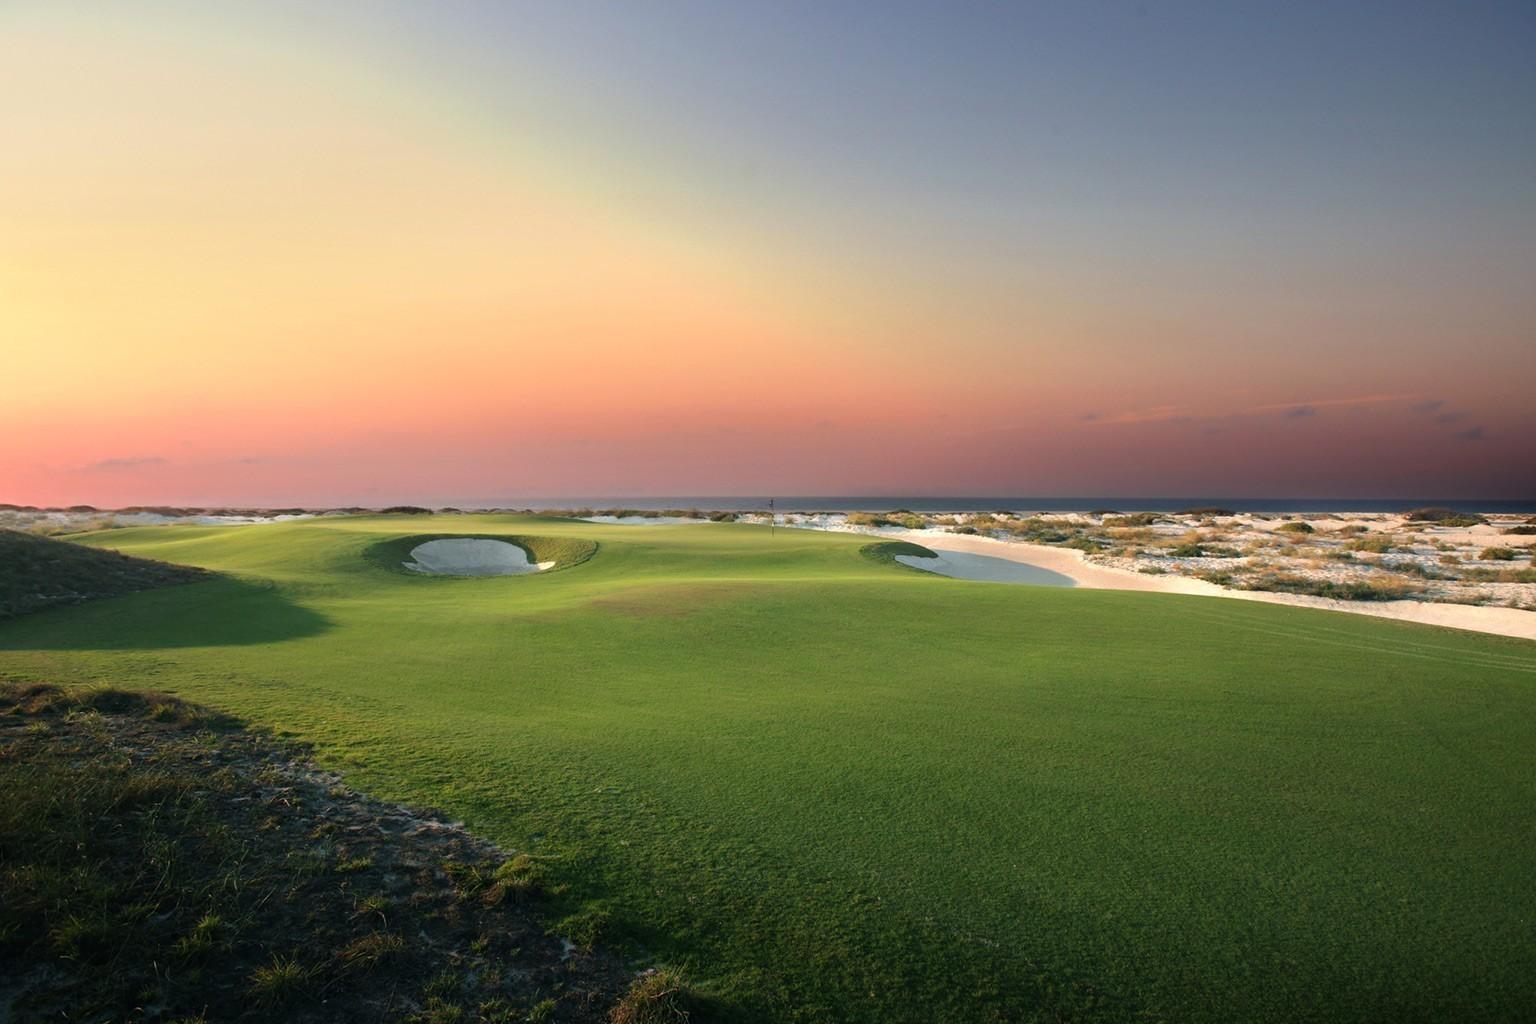 Hotels In Bani Yas Island Abu Dhabi